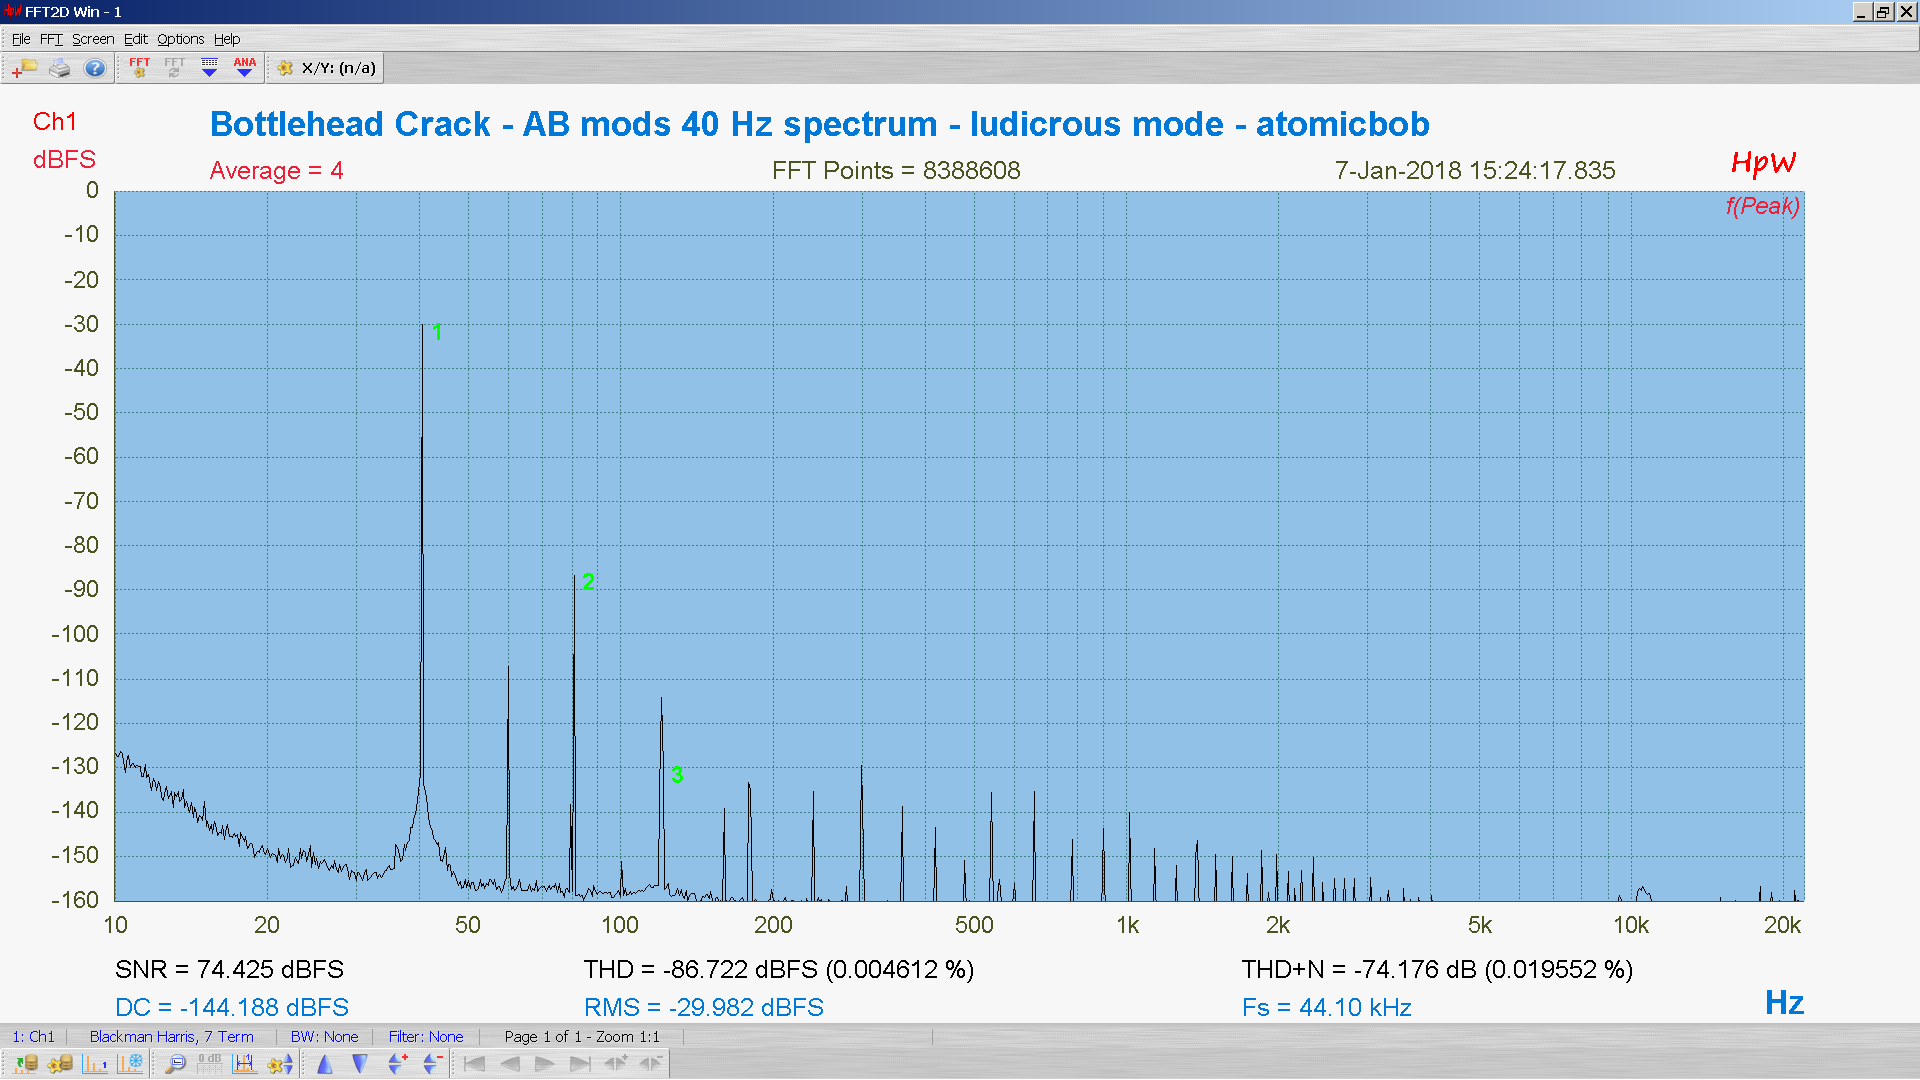 20180107-25 BH Crack e80cc 5998 40 Hz THD THD+N 8M FFT- ASIO -30 dBFS - HpW.PNG